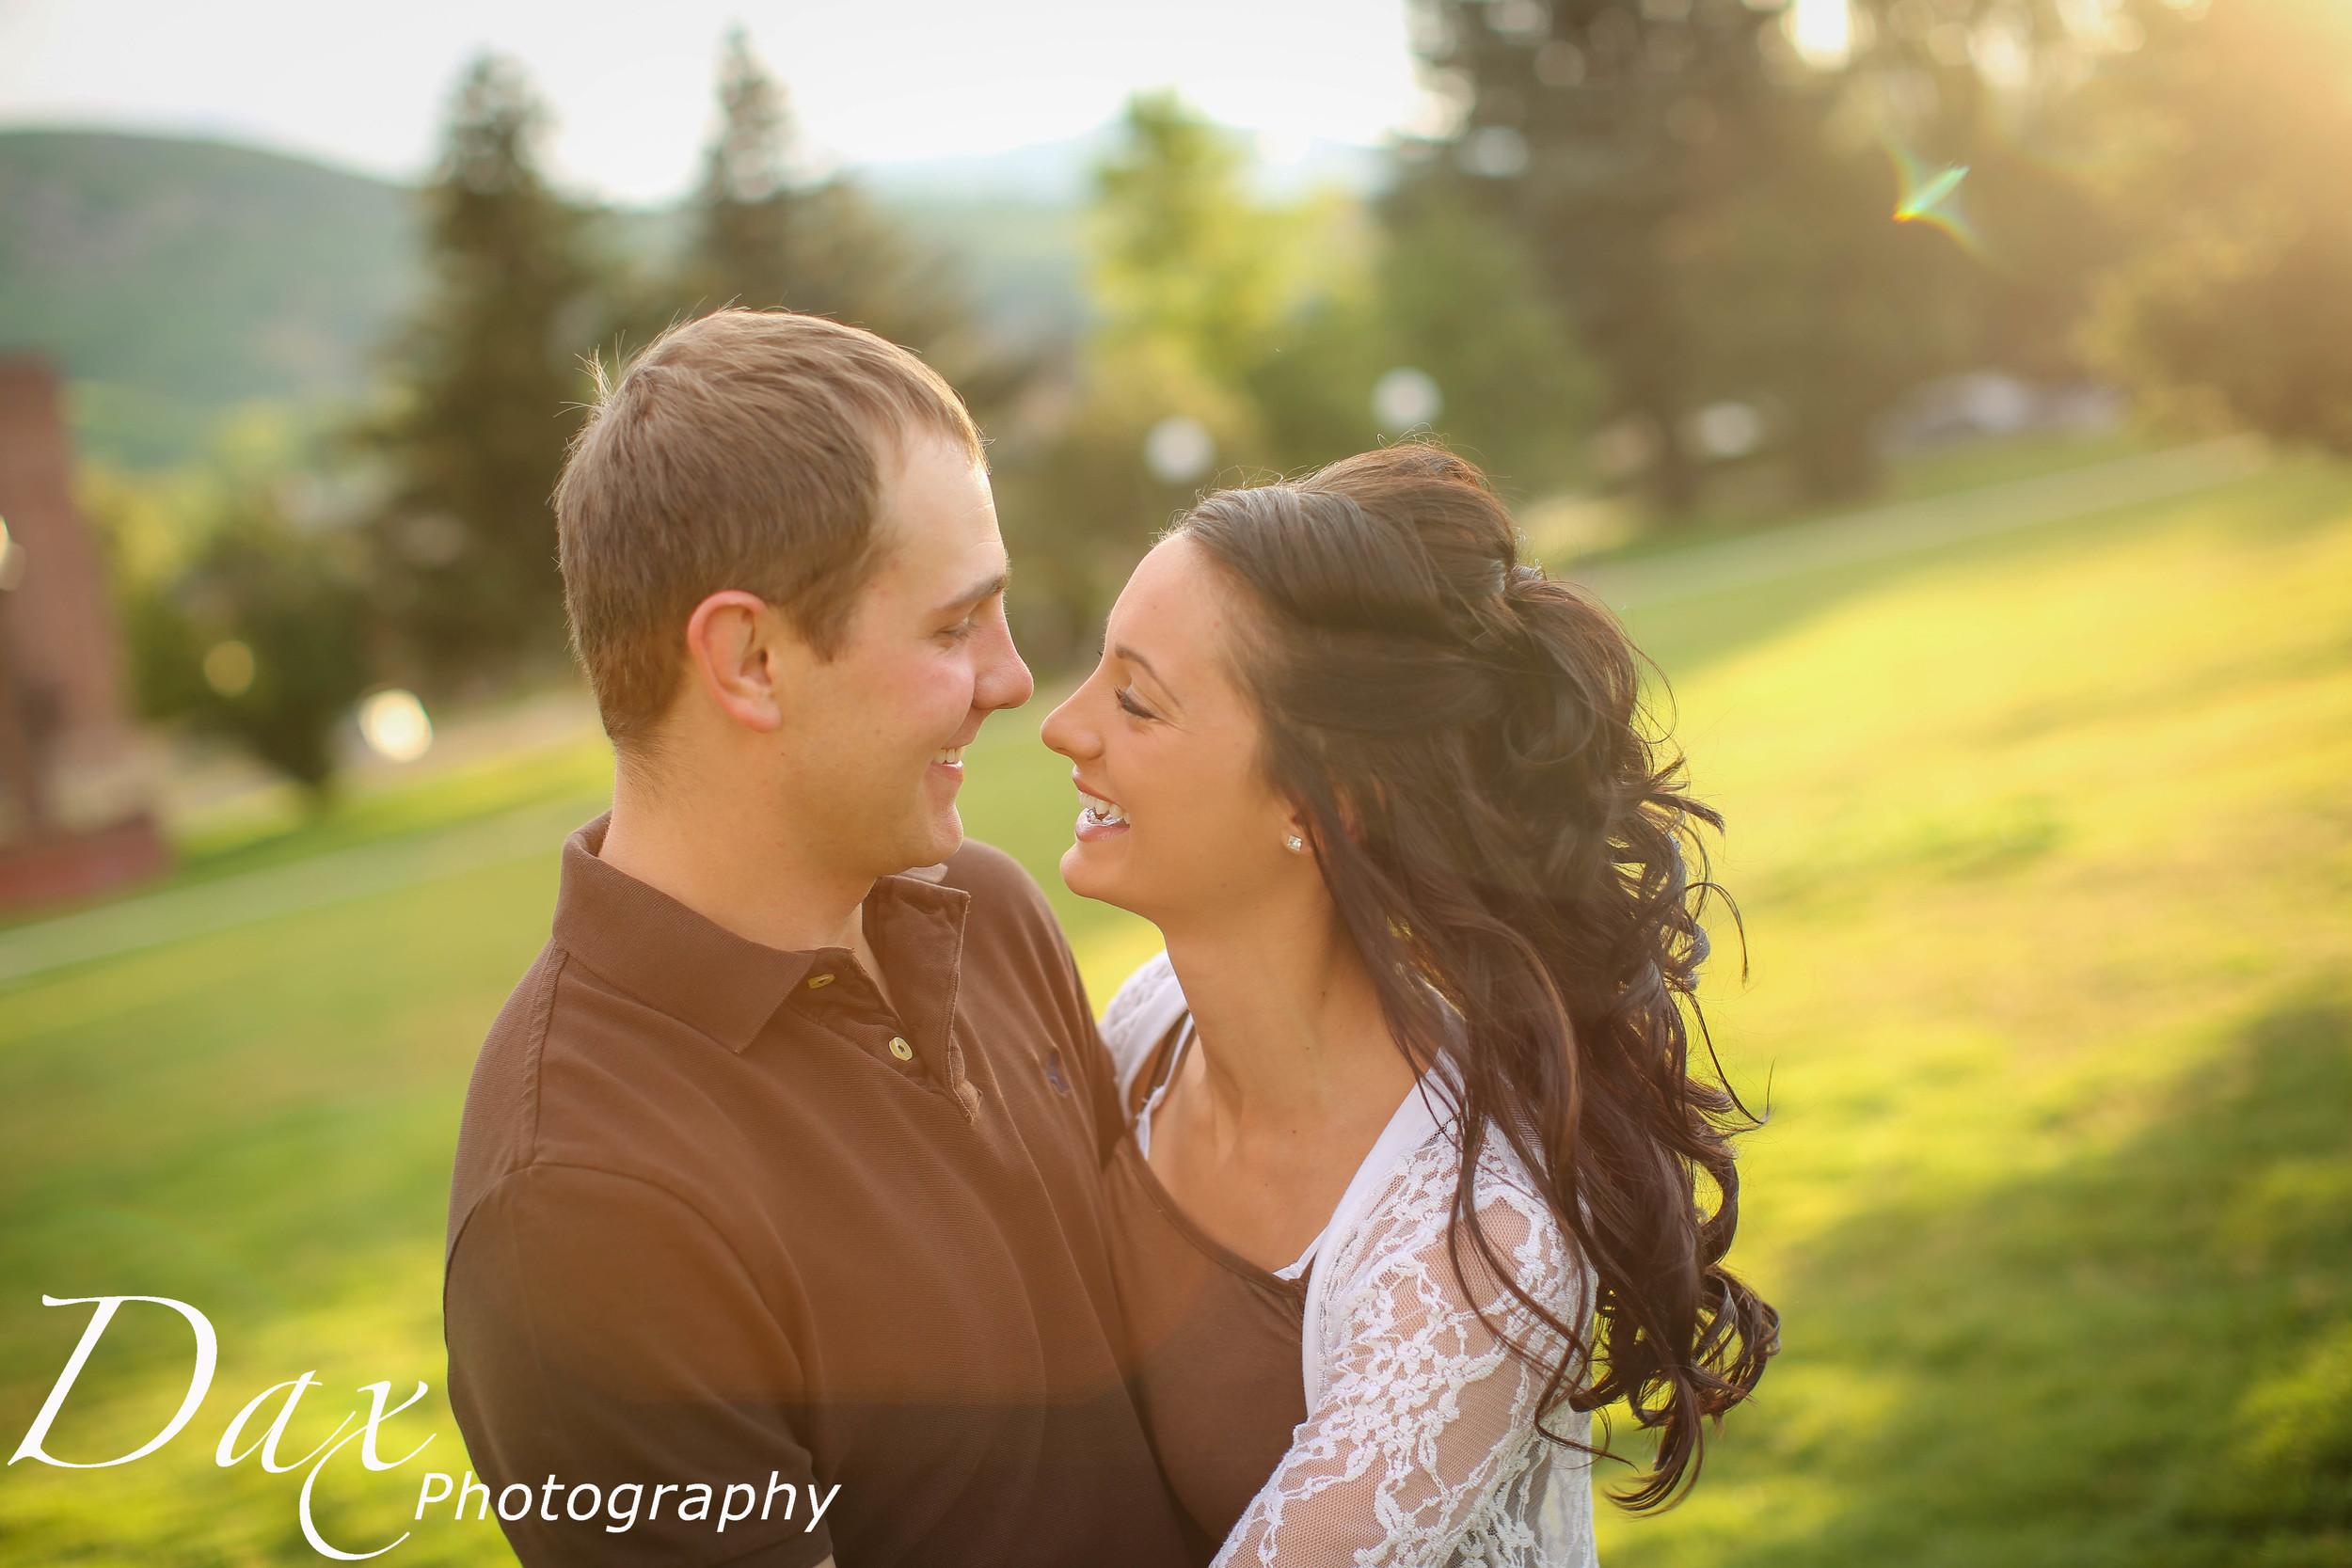 wpid-Montana-photographer-Engagement-Portrait-42551.jpg